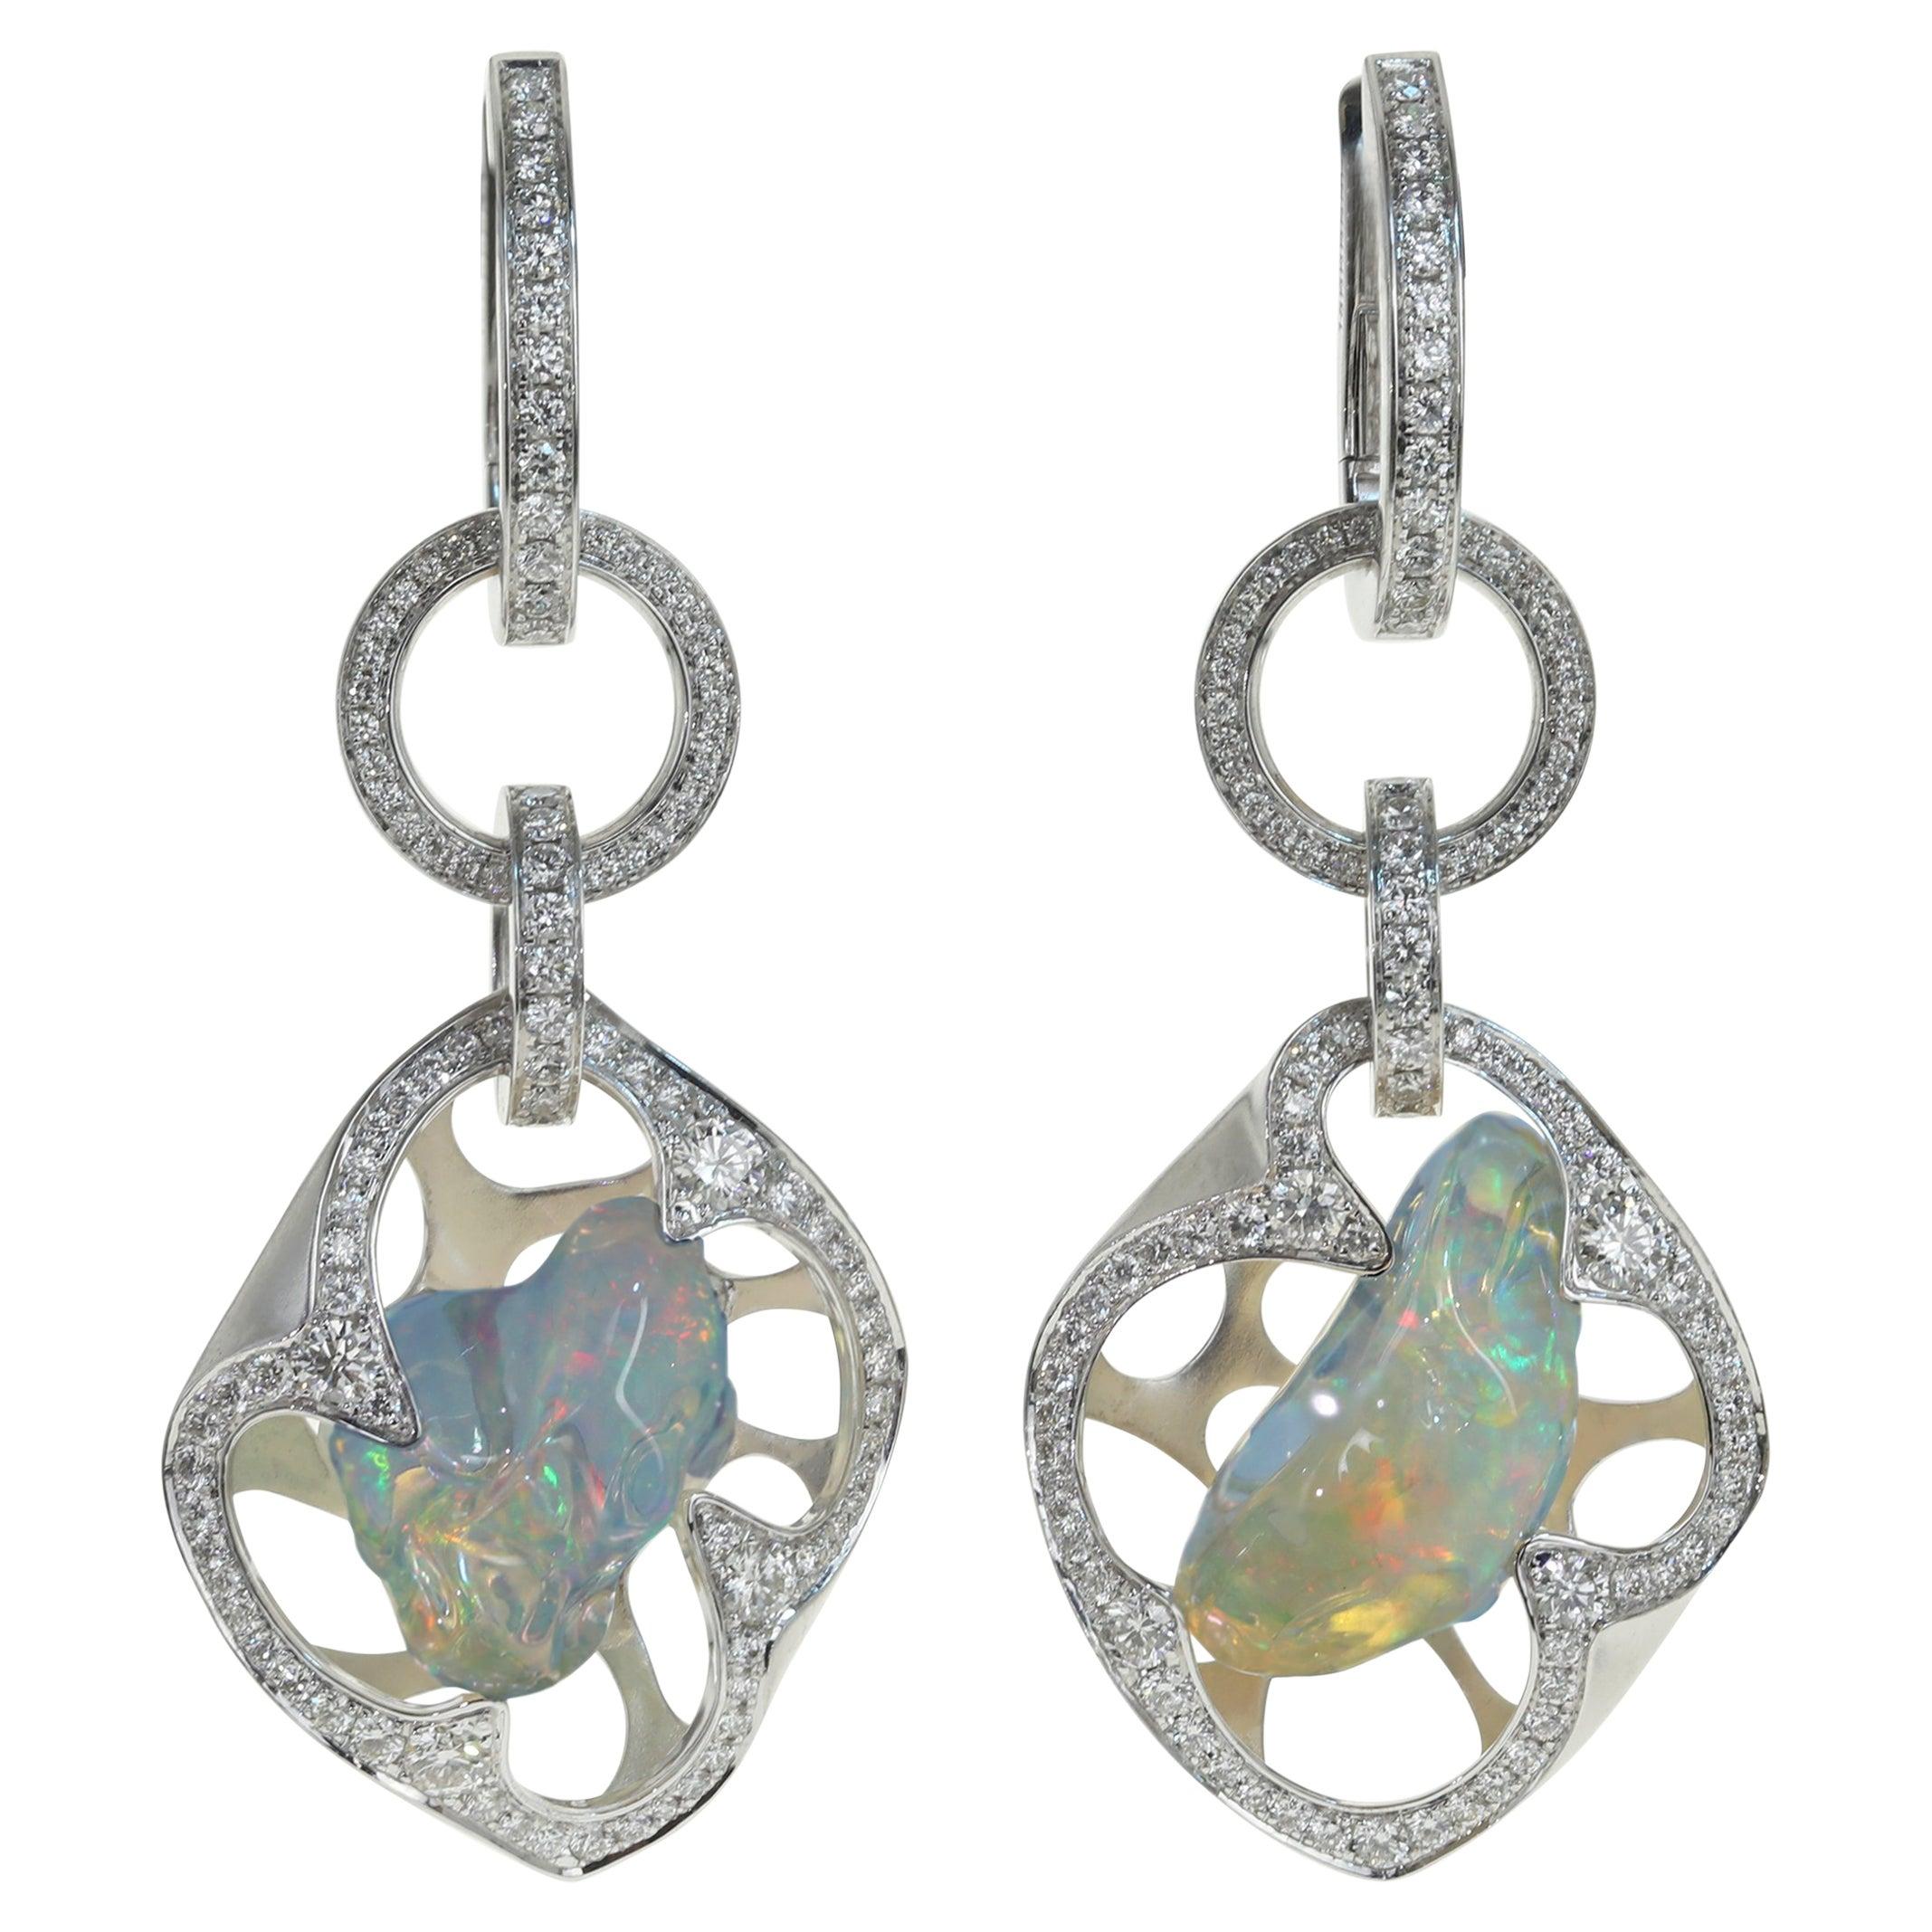 Mexican Opal, Diamond - One of a Kind 18 Karat White Gold Earrings